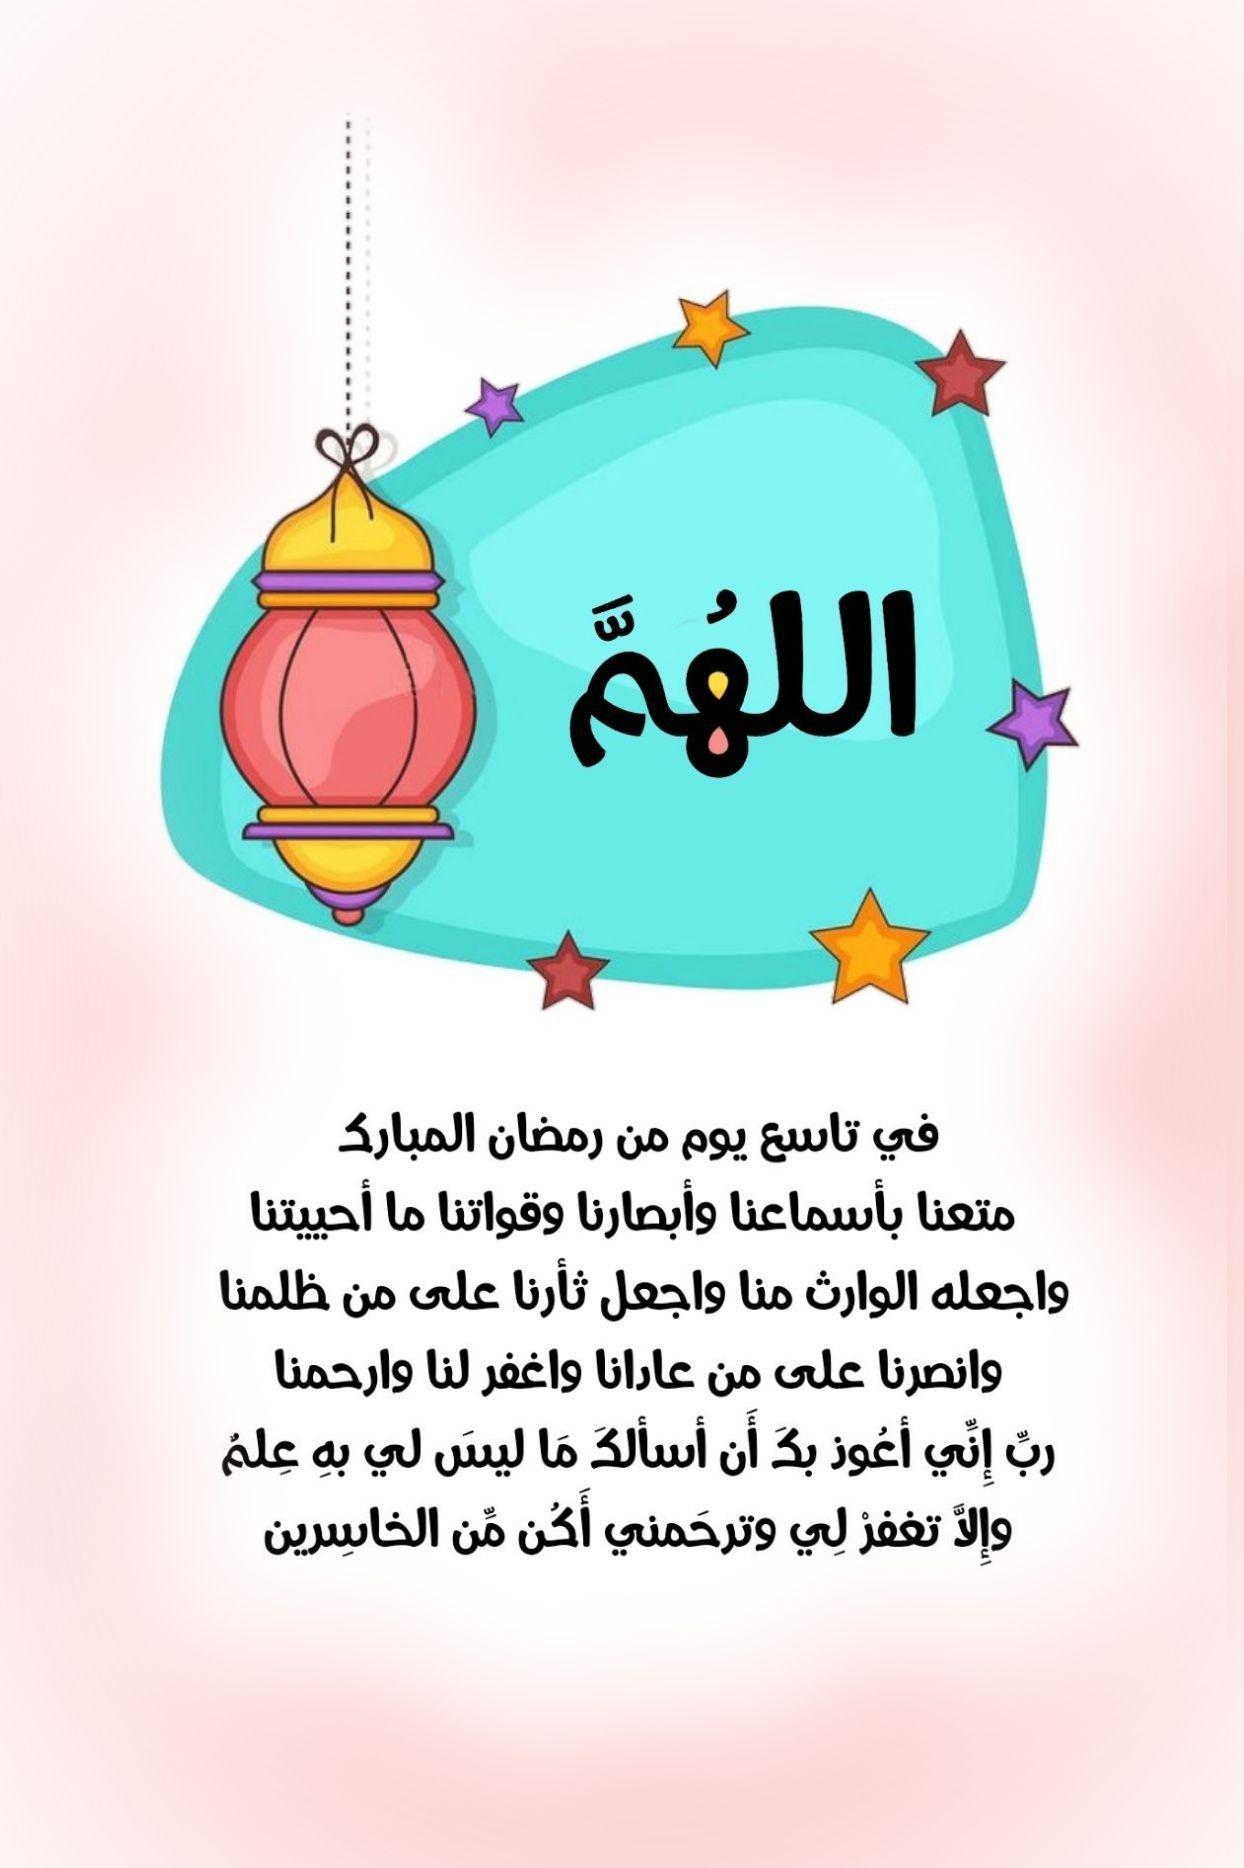 Pin By صورة و كلمة On رمضان كريم Ramadan Kareem In 2020 Motivational Art Quotes Ramadan Crafts Ramadan